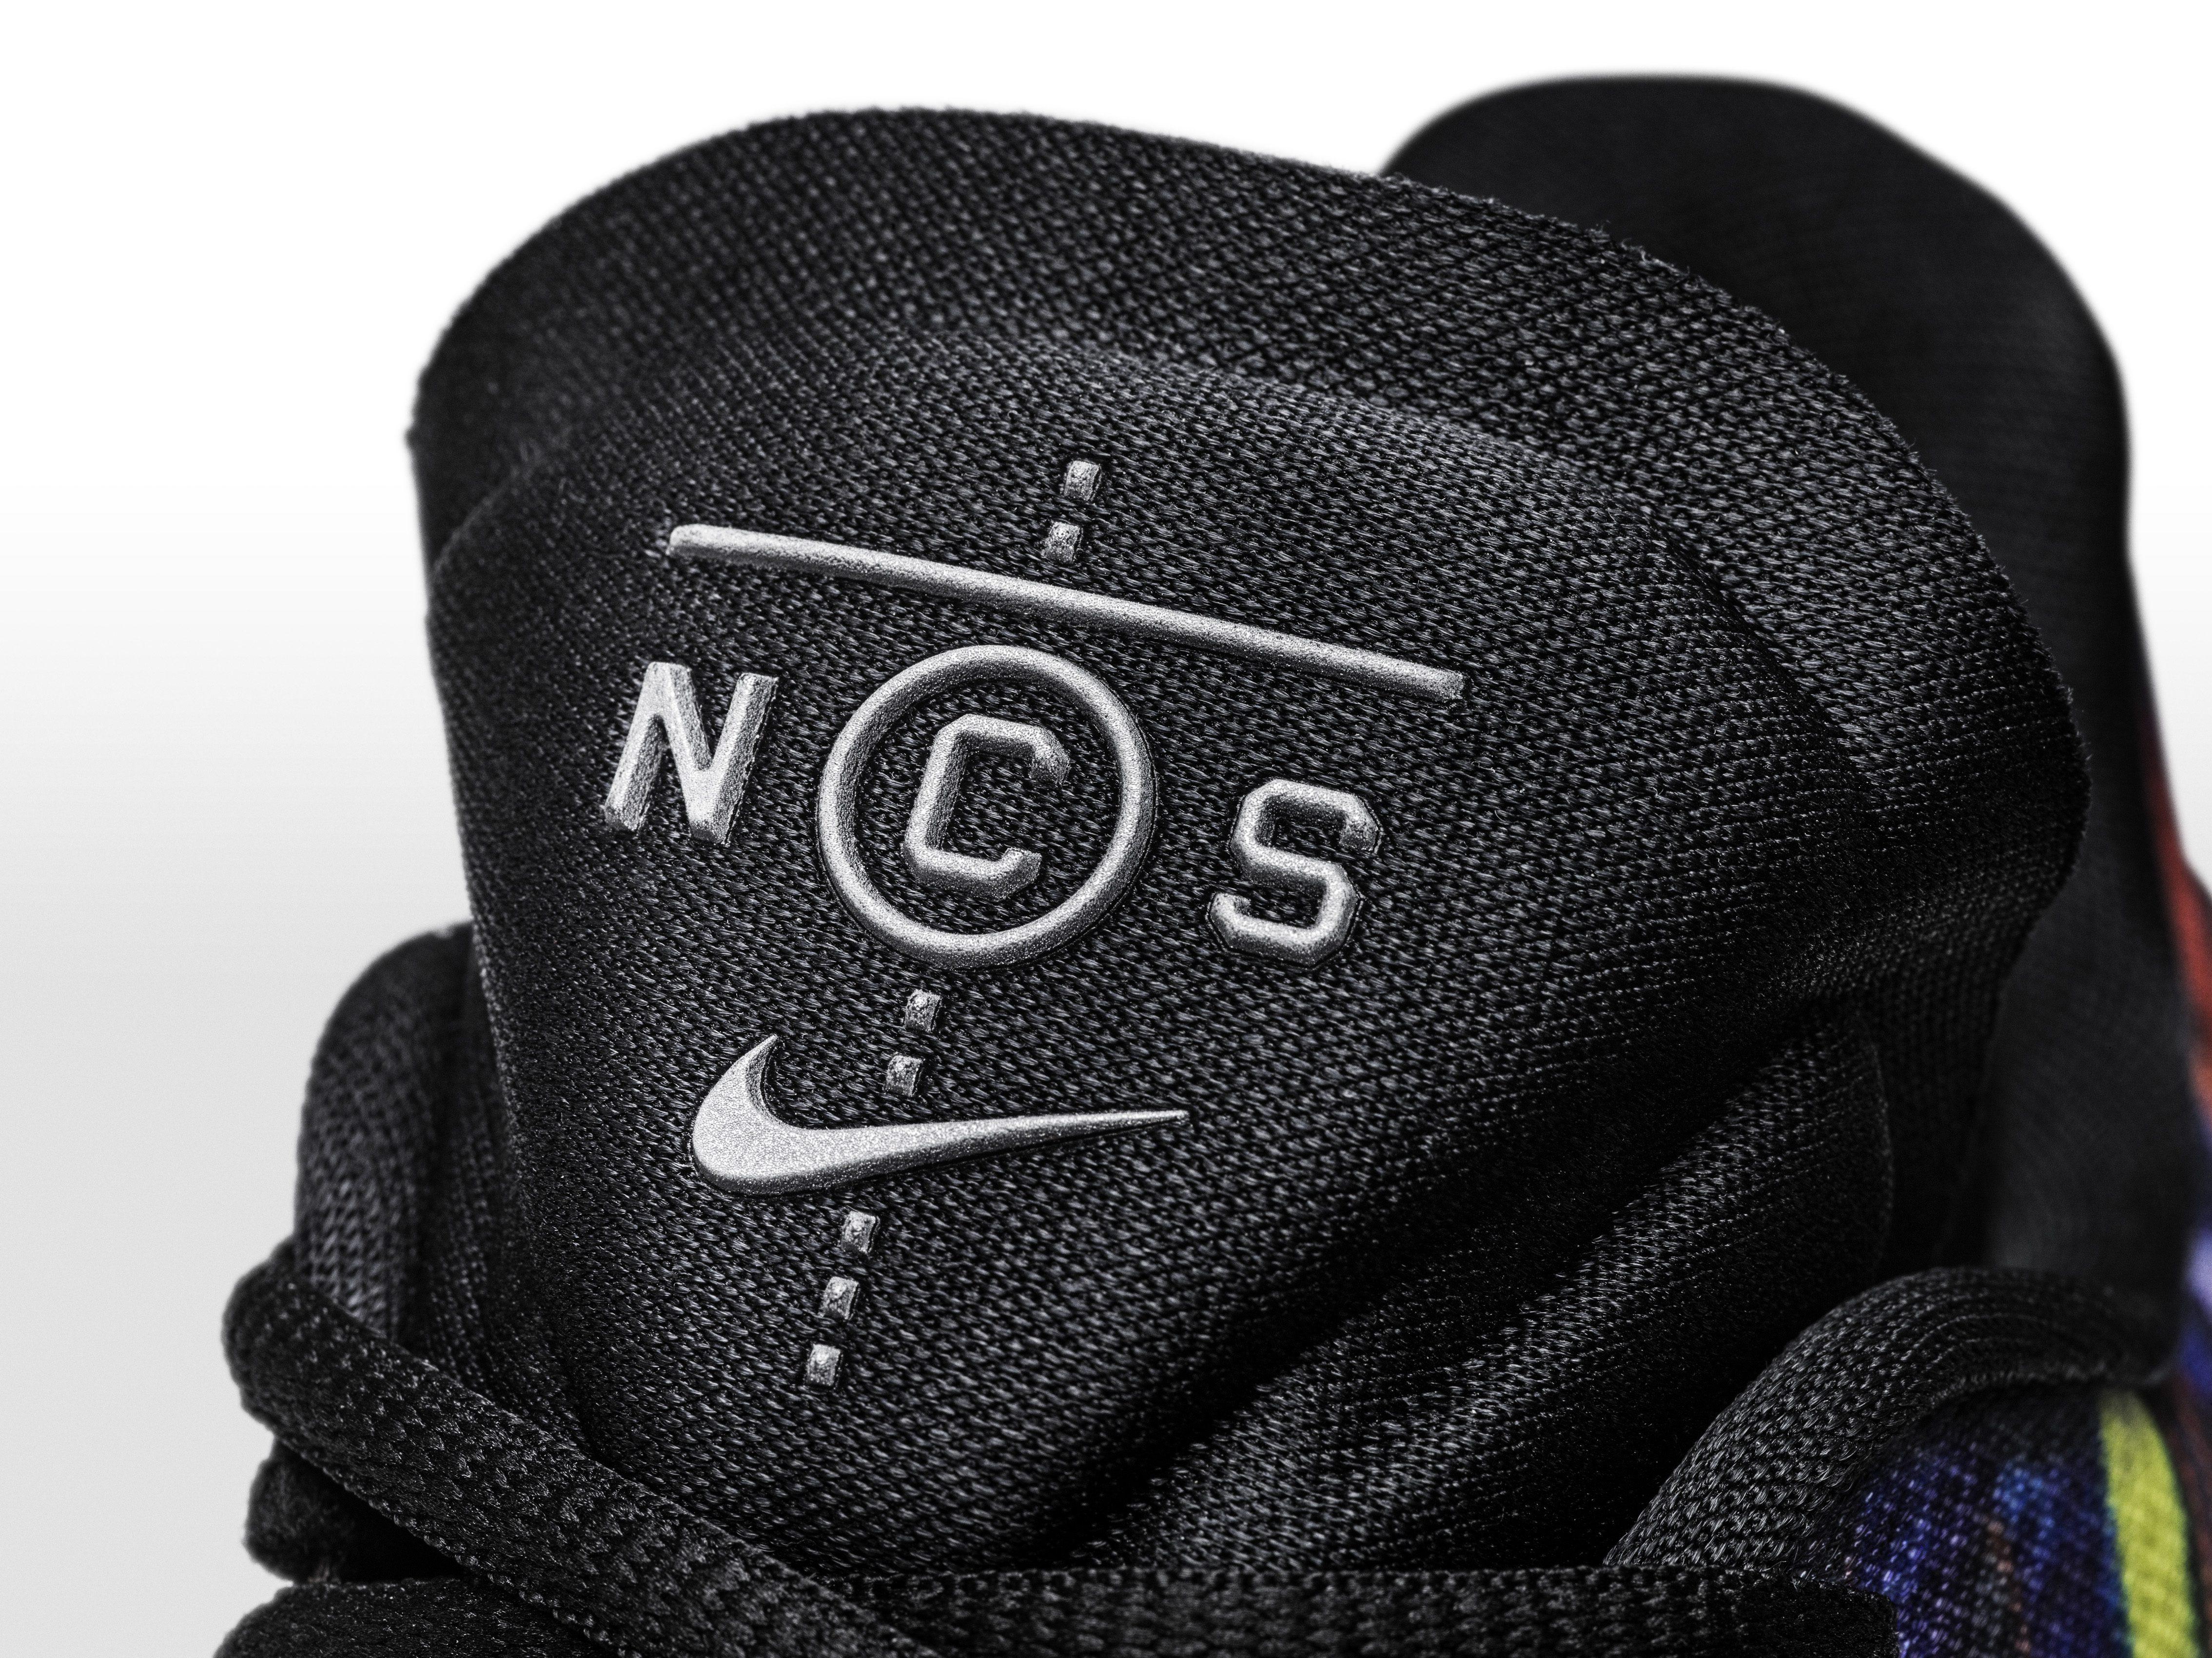 Nike_Net_Collectors_Society_HYPERCHASE_DET_02_39415